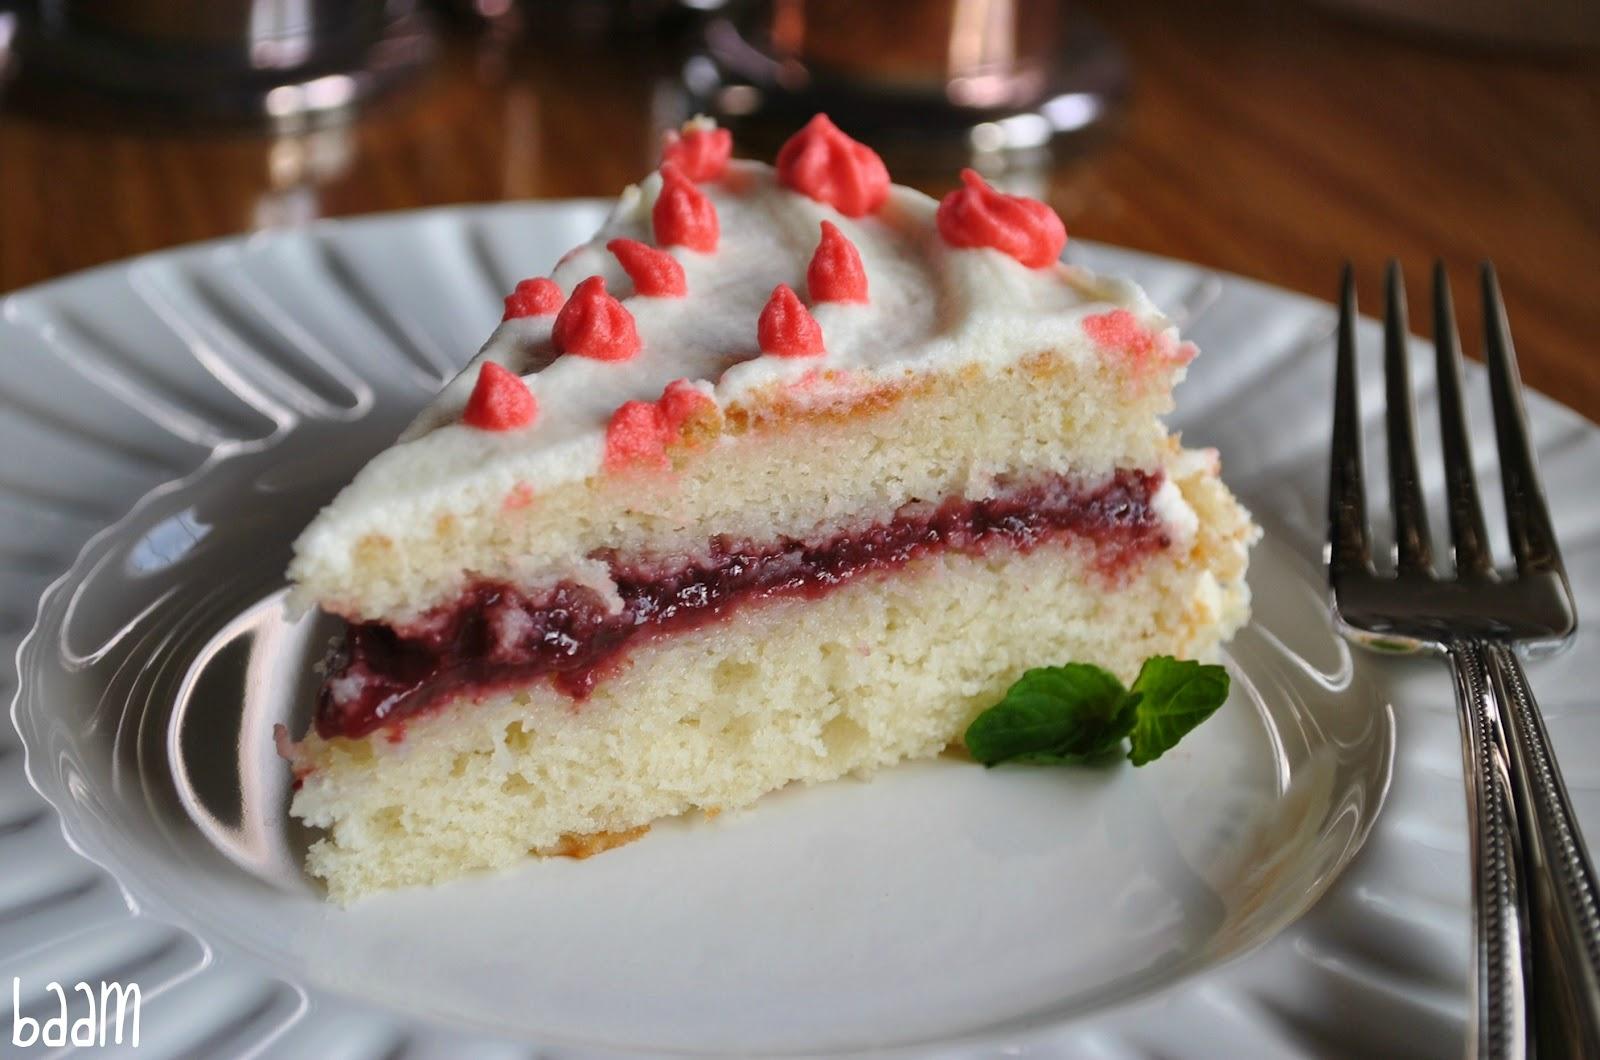 Strawberry Cake Recipe With Jelly: Beti Vanilla: White Cake With Strawberry Jam